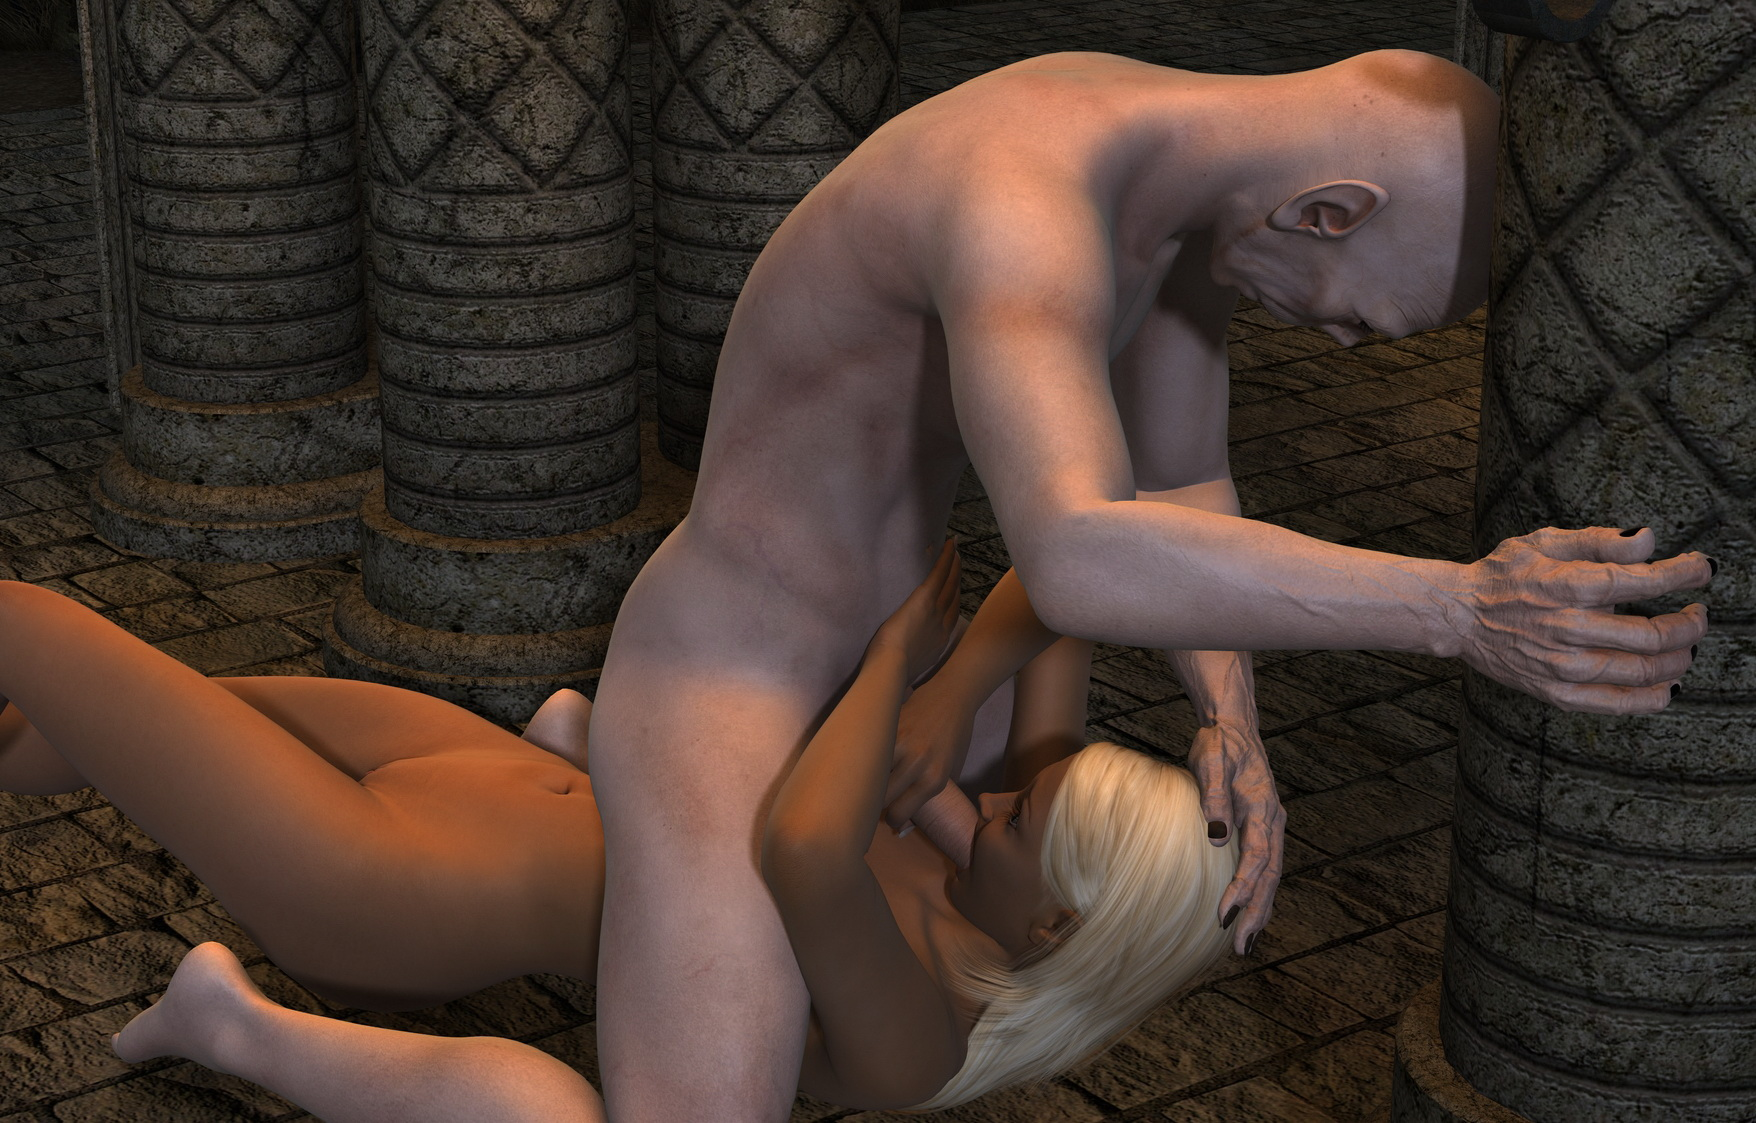 Cartoon rape wallpaper video nude galleries